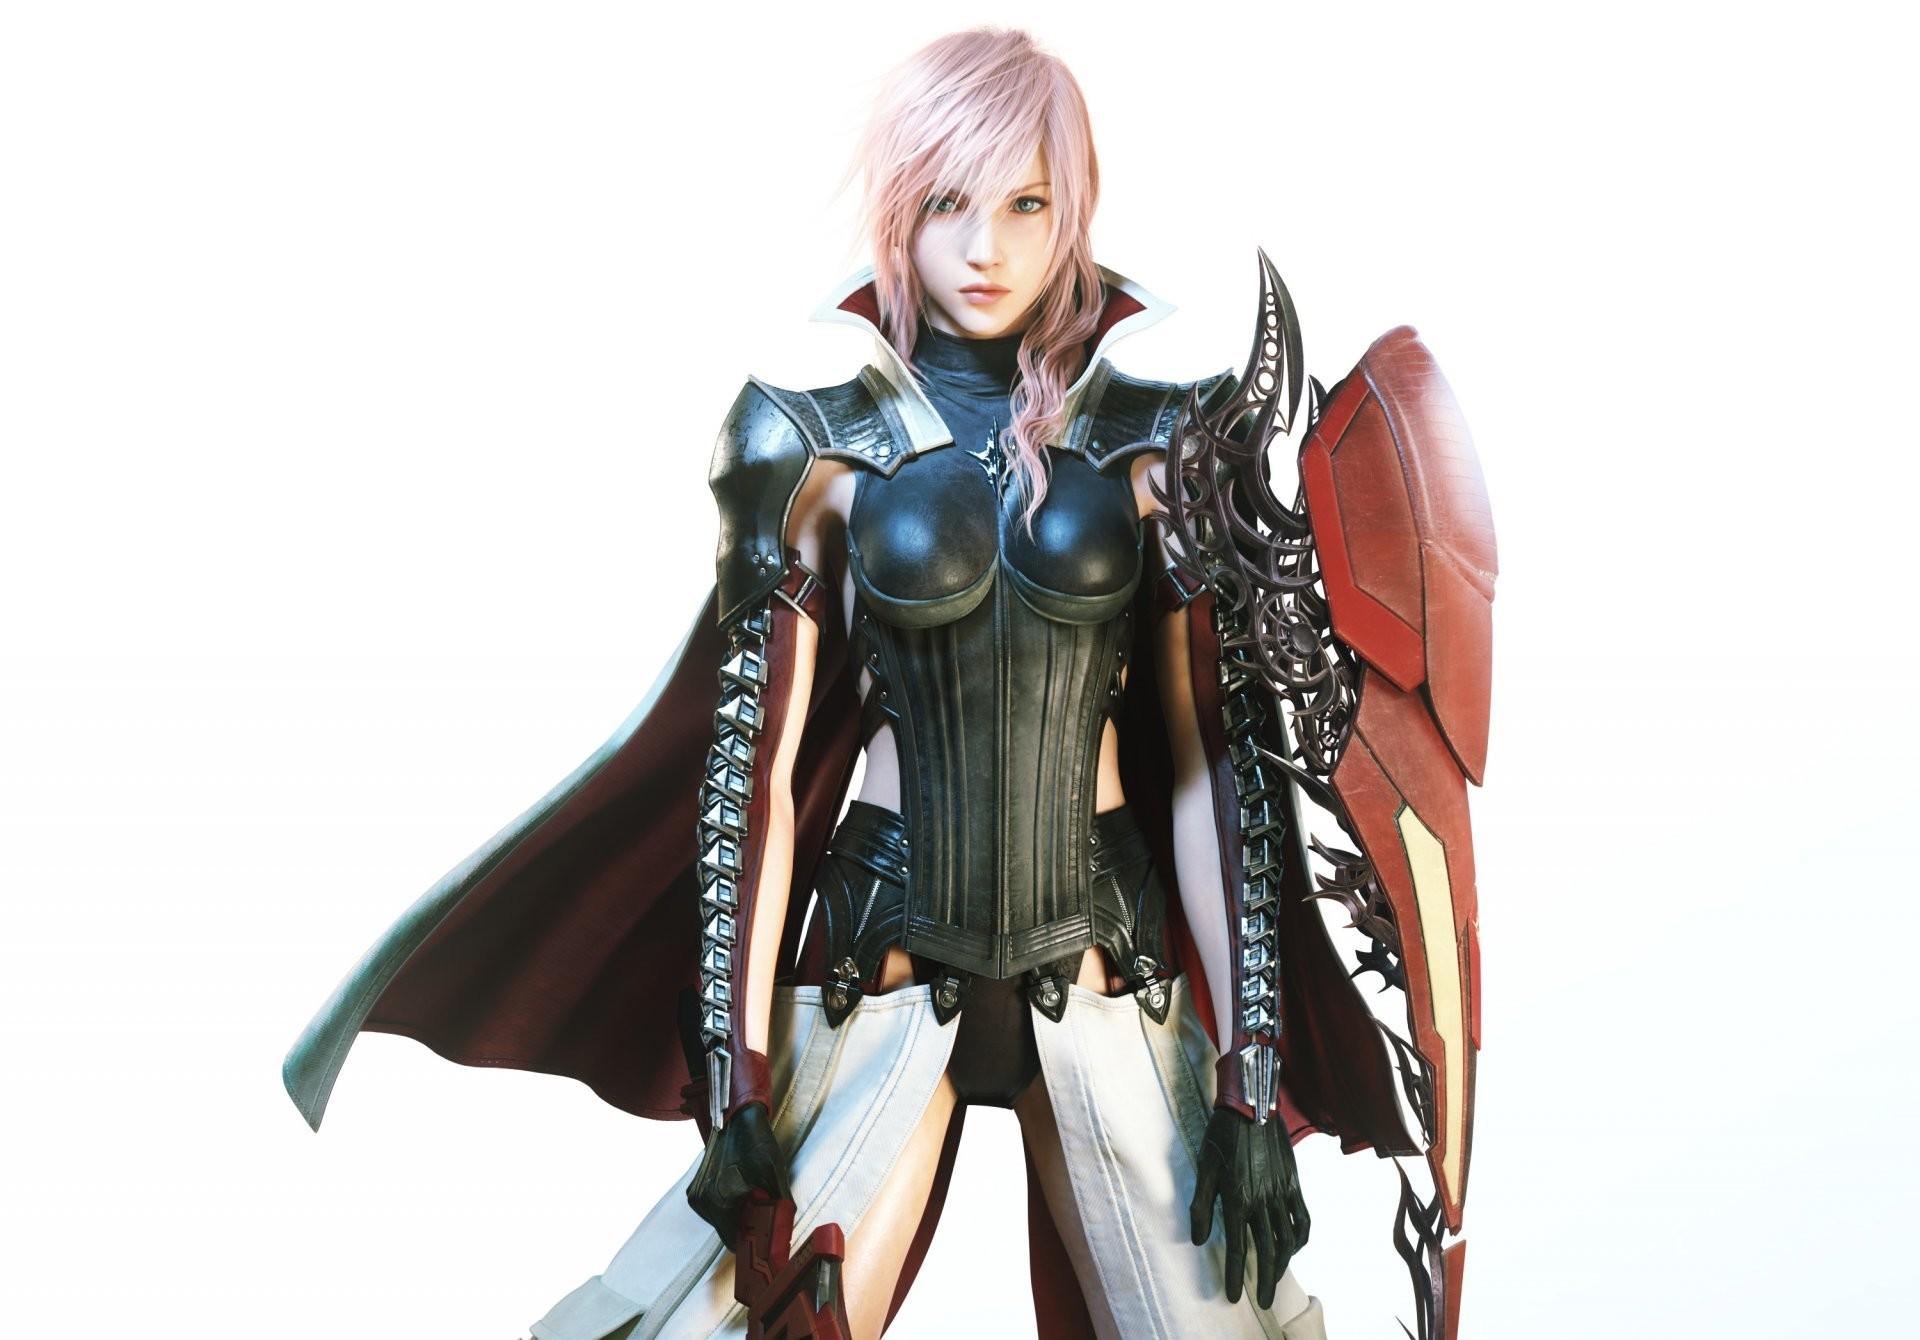 lightning returns: ffxiii final fantasy xiii final fantasy 13 girl lightning  lightning armour view square